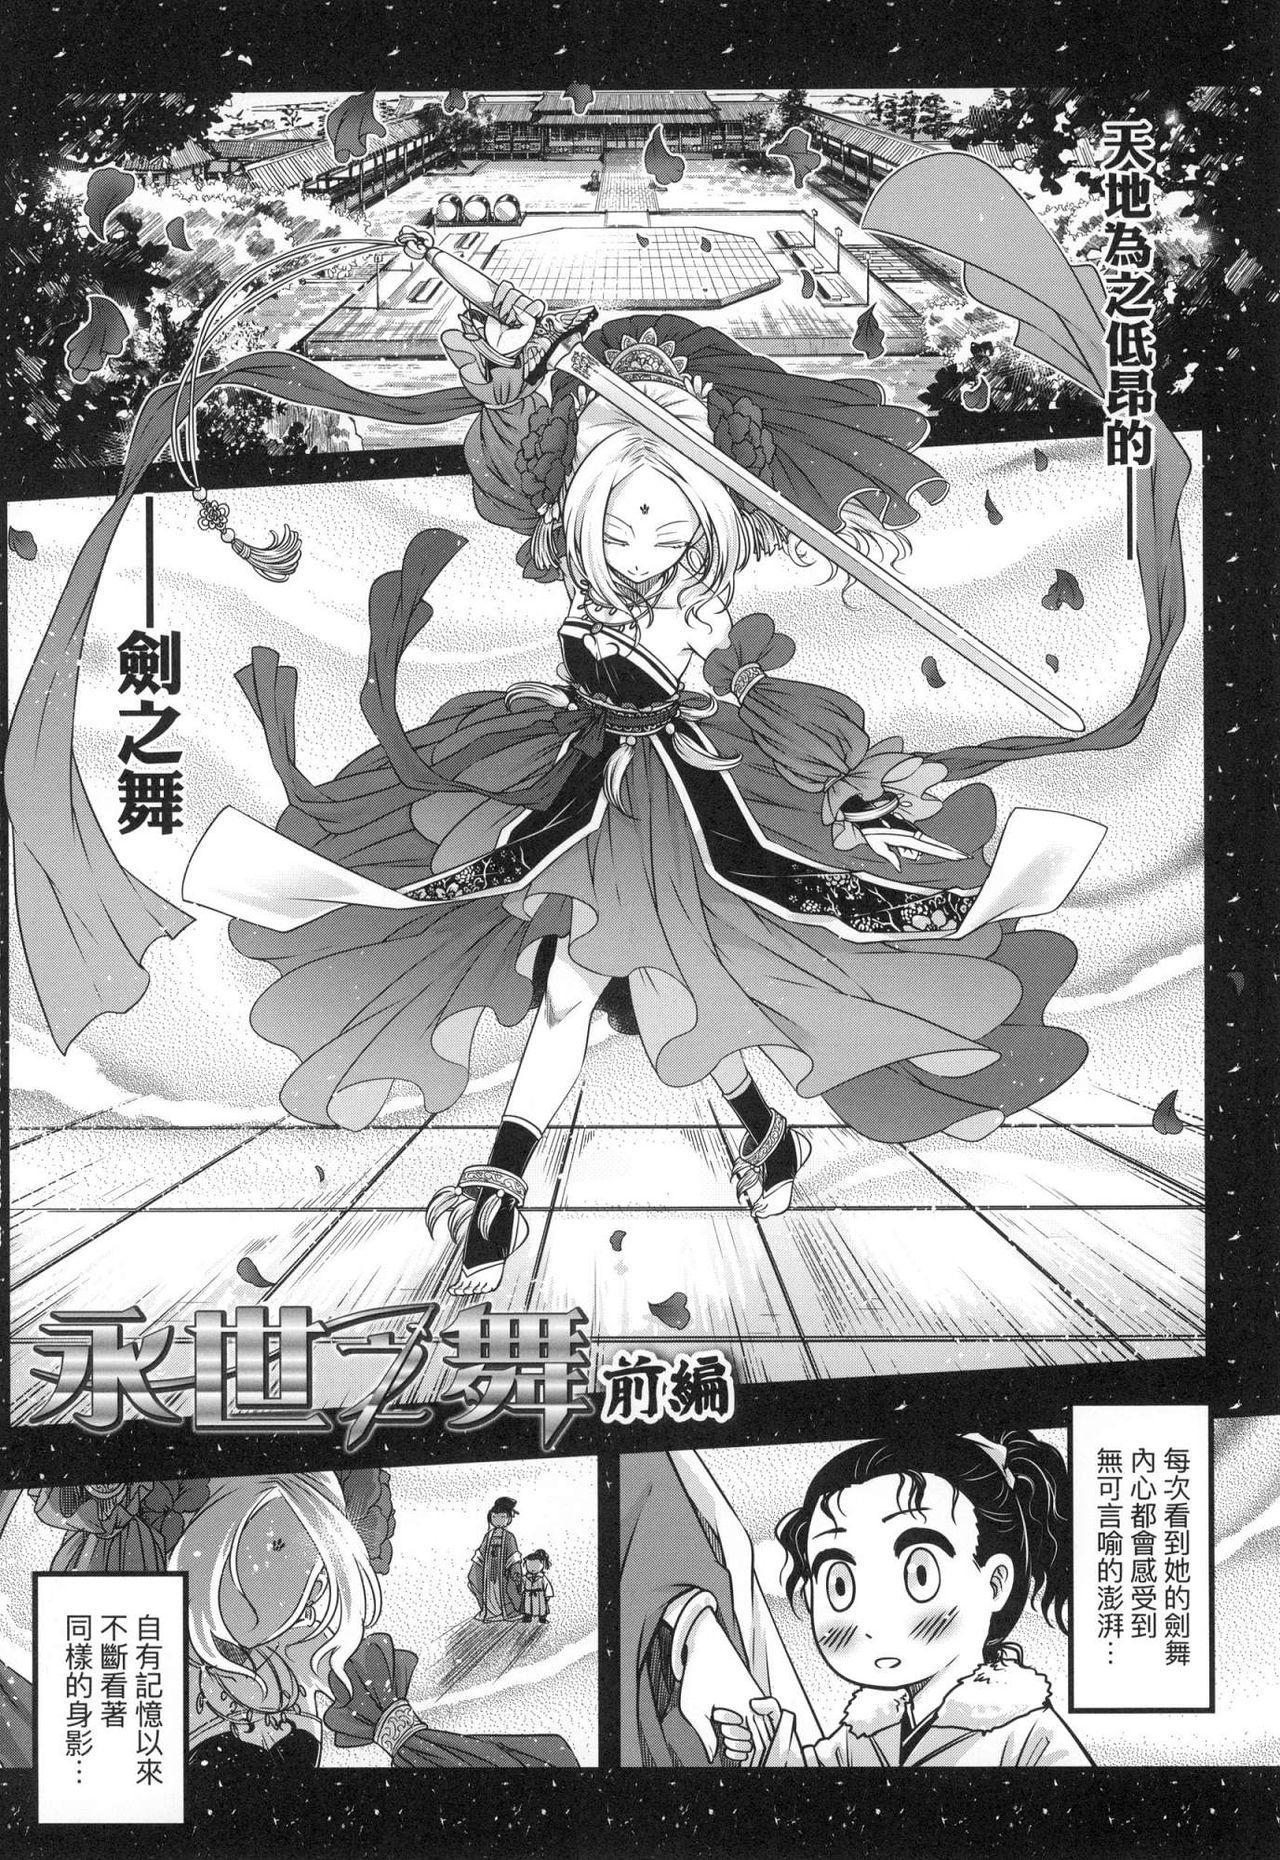 Eisei no Zen 52